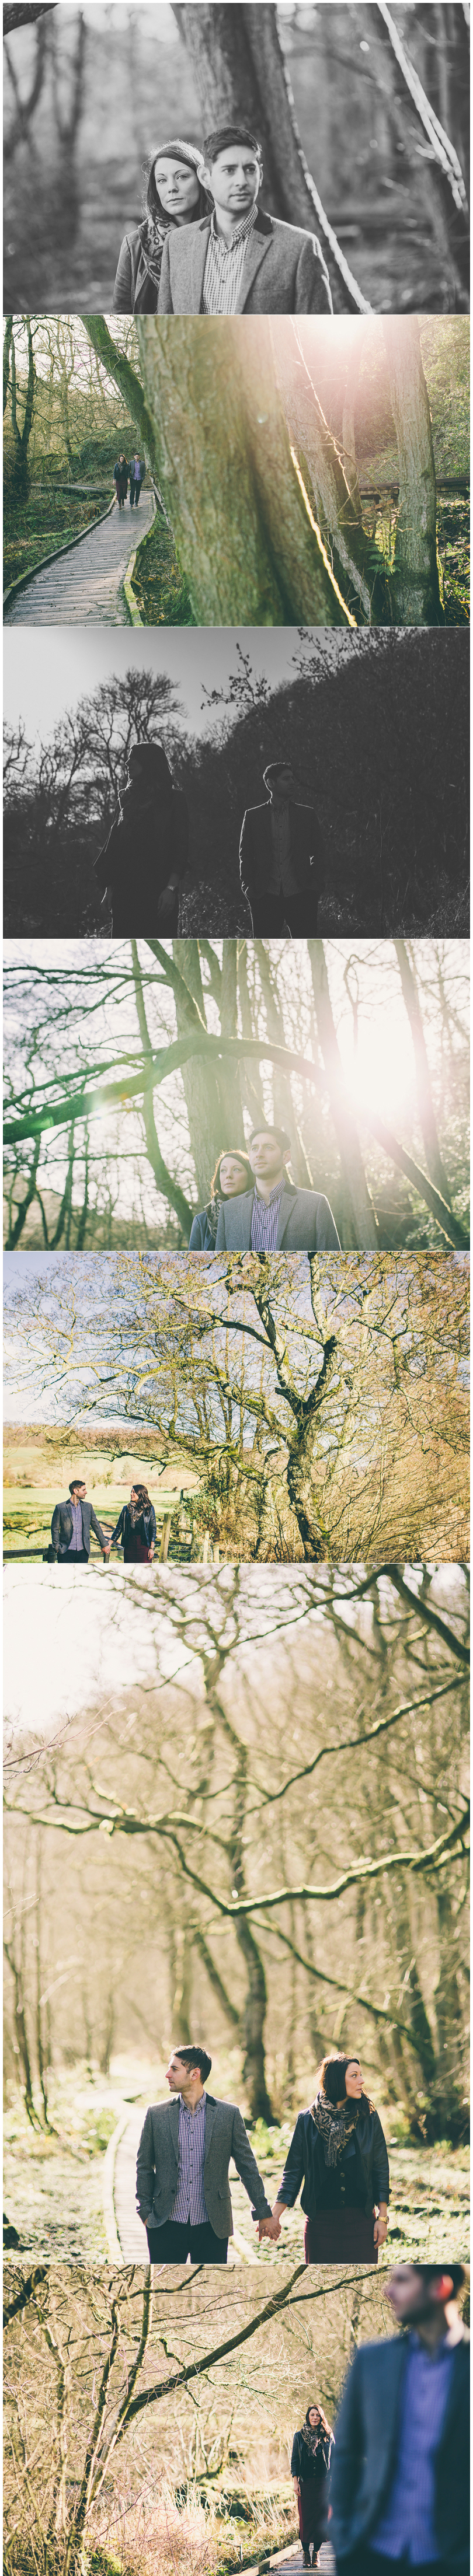 Neil_Jackson_Photographic_Scarborough_York_Yorkshire_Wedding_Photographer_Julie_Jon_Forge_Valley_Engagement_Shoot_Scarborough_Blog2